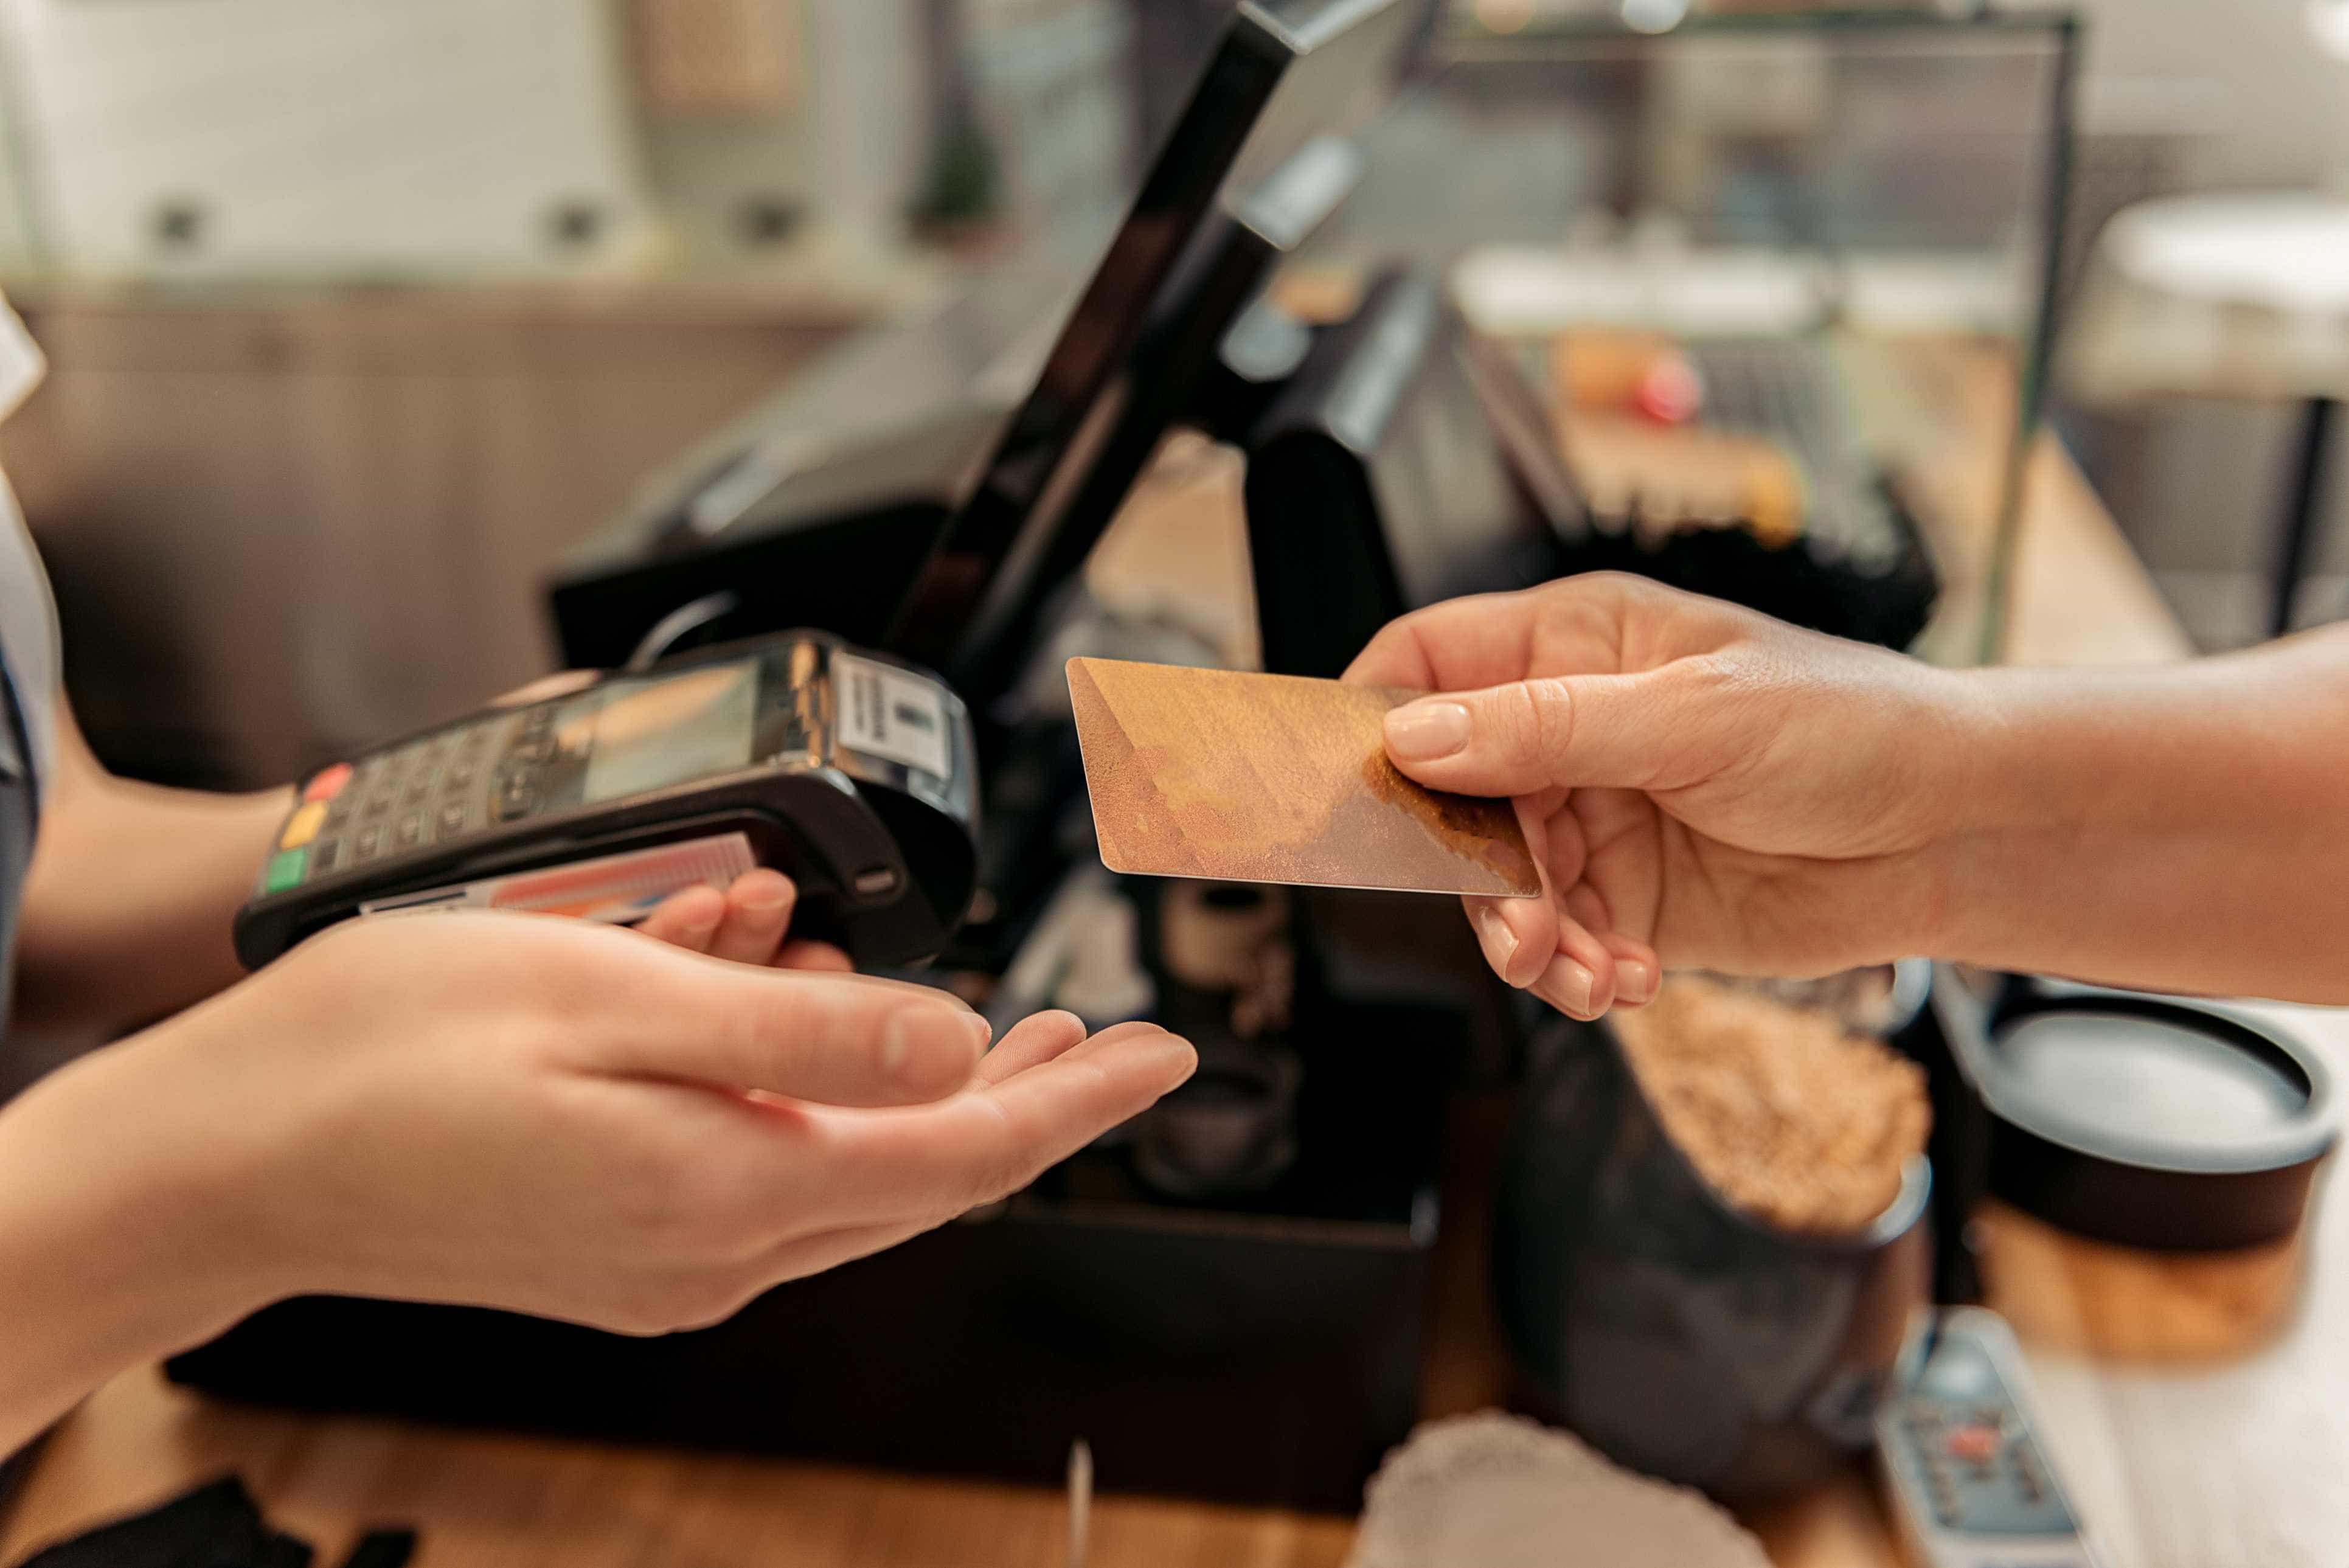 Governo volta a penalizar crédito ao consumo com o Imposto do Selo